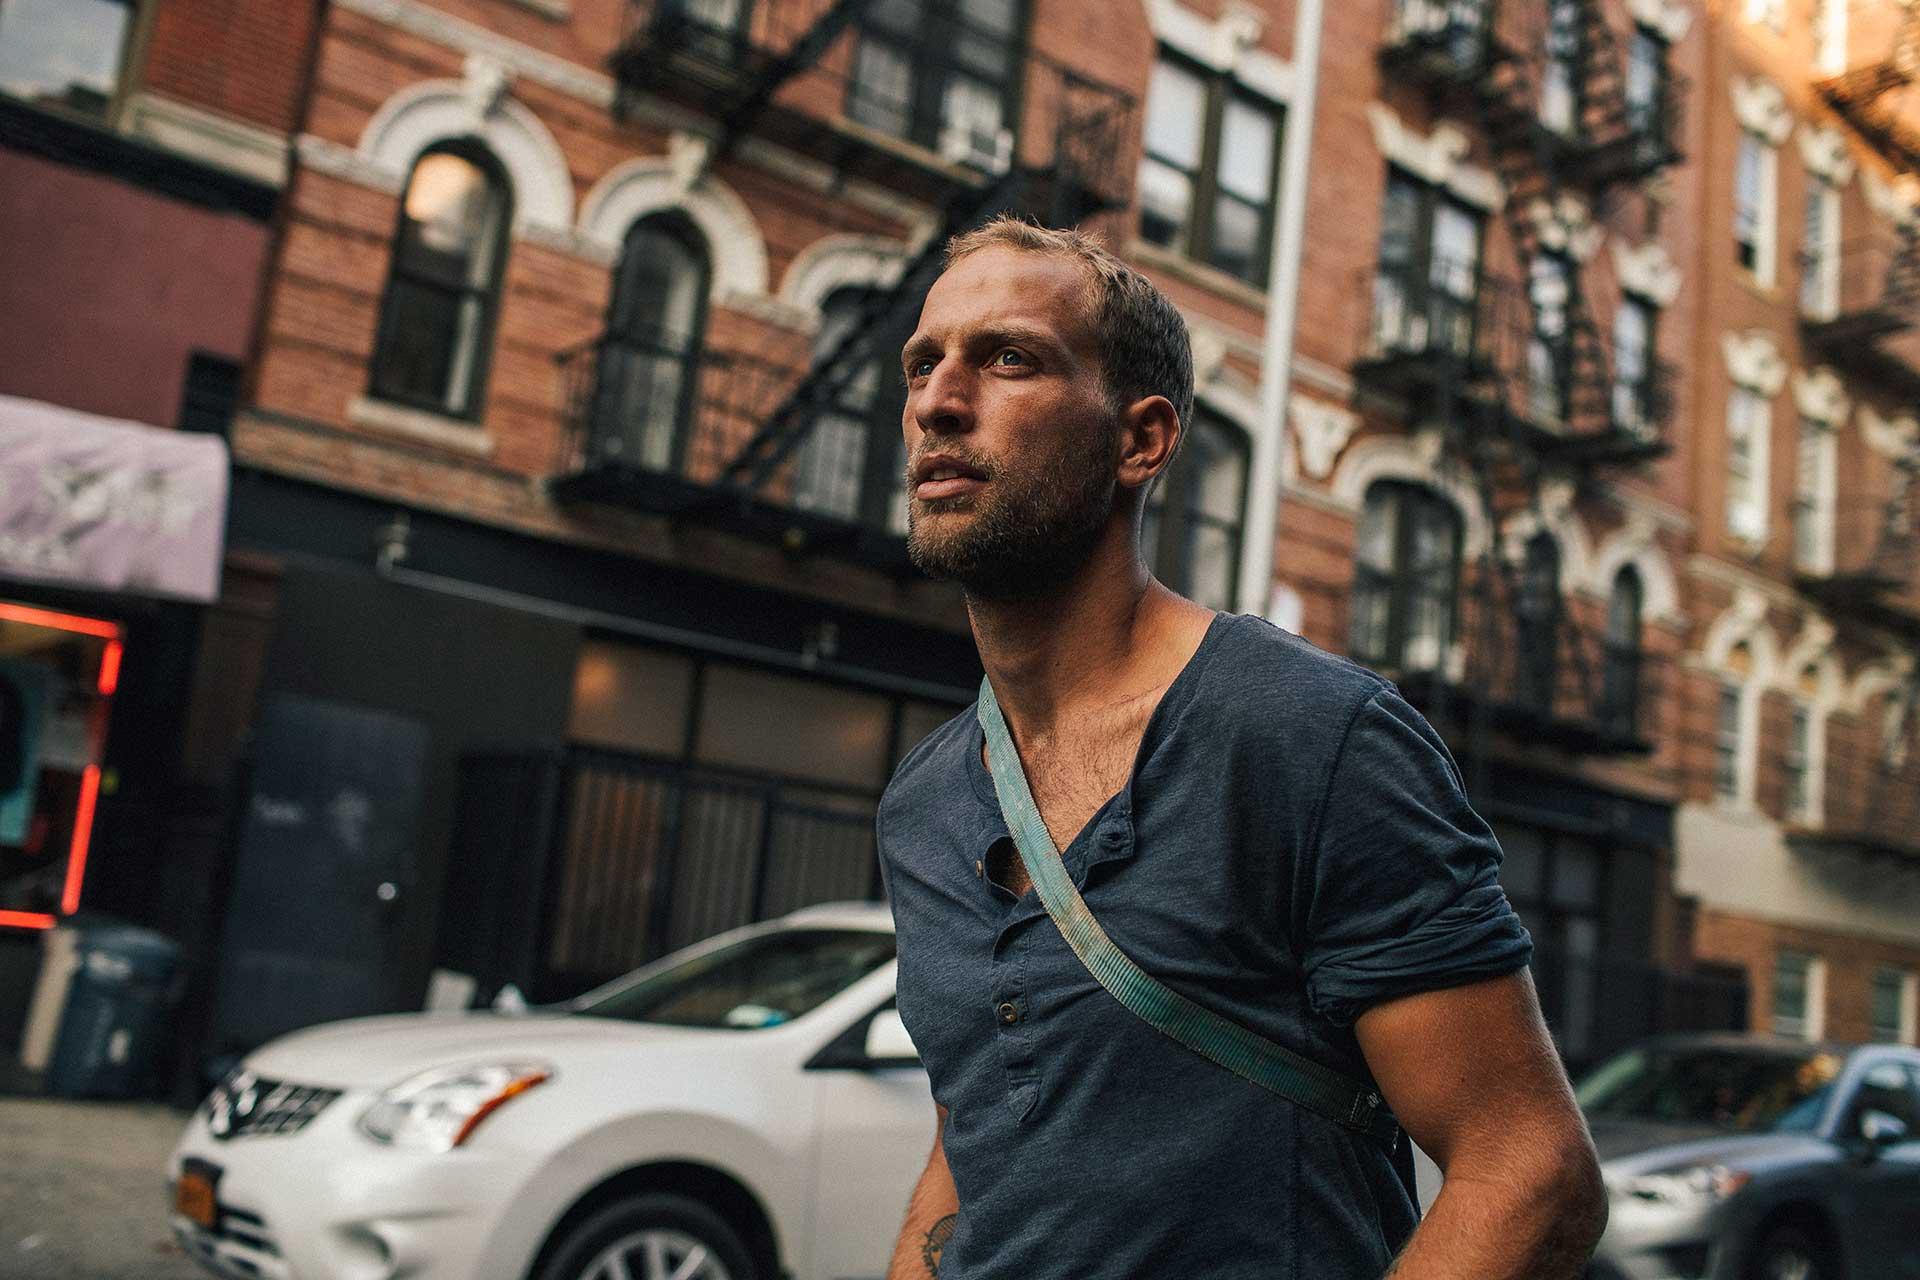 Lifestyle Porträt People Fotograf Michael Müller New York